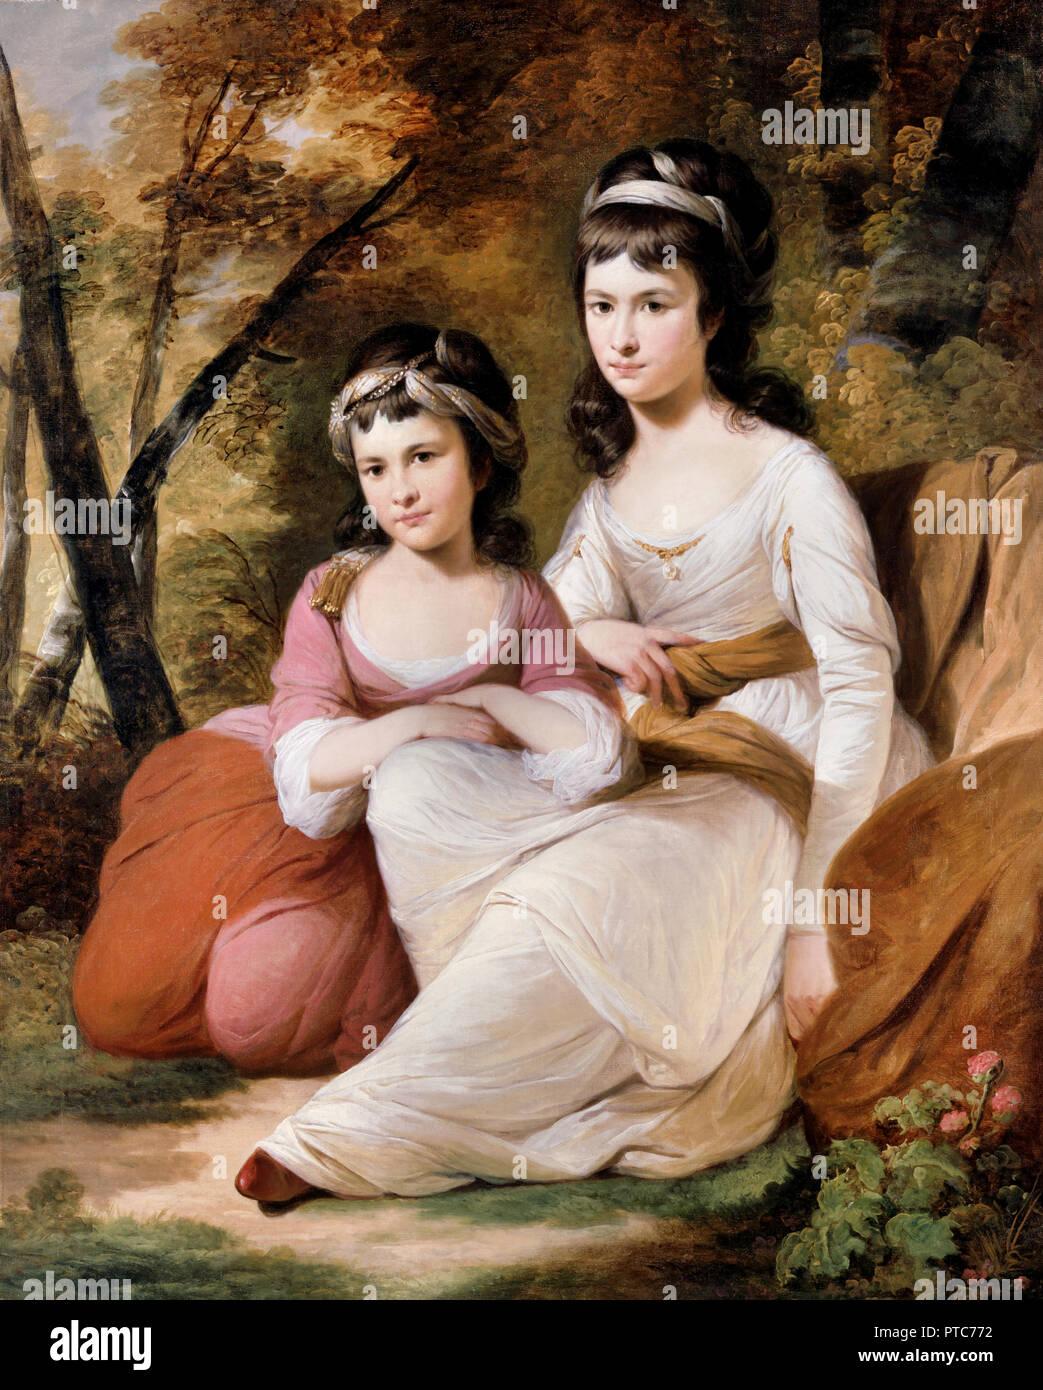 Tilly Kettle, Eliza y María Davidson, circa 1784, óleo sobre lienzo, Dulwich Picture Gallery, Londres, Inglaterra. Imagen De Stock